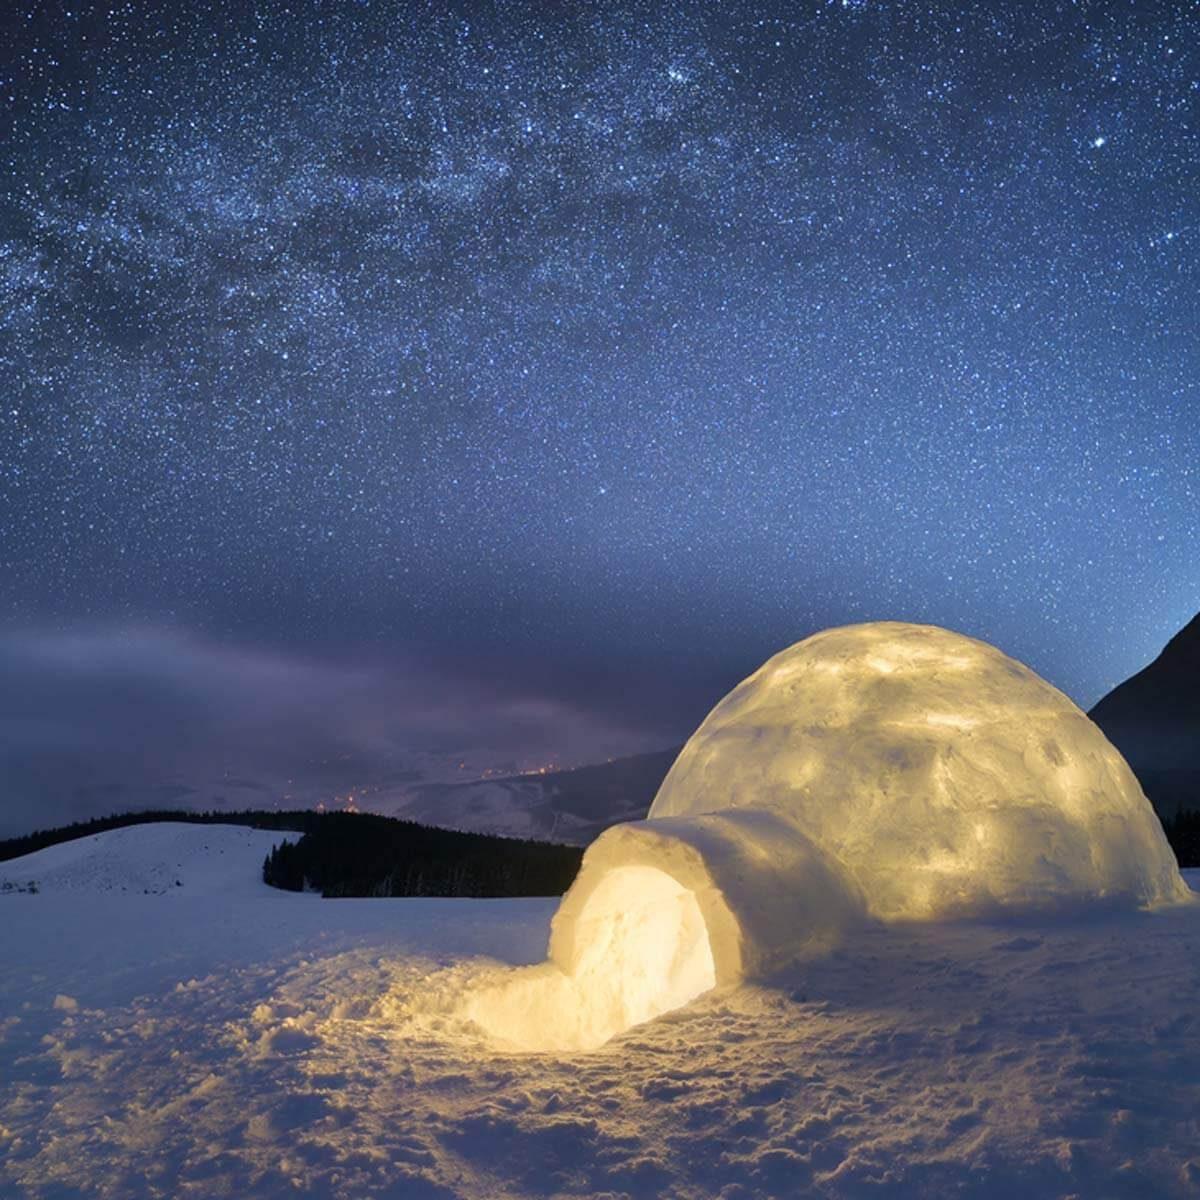 shutterstock_496337095 stary night snow fort igloo